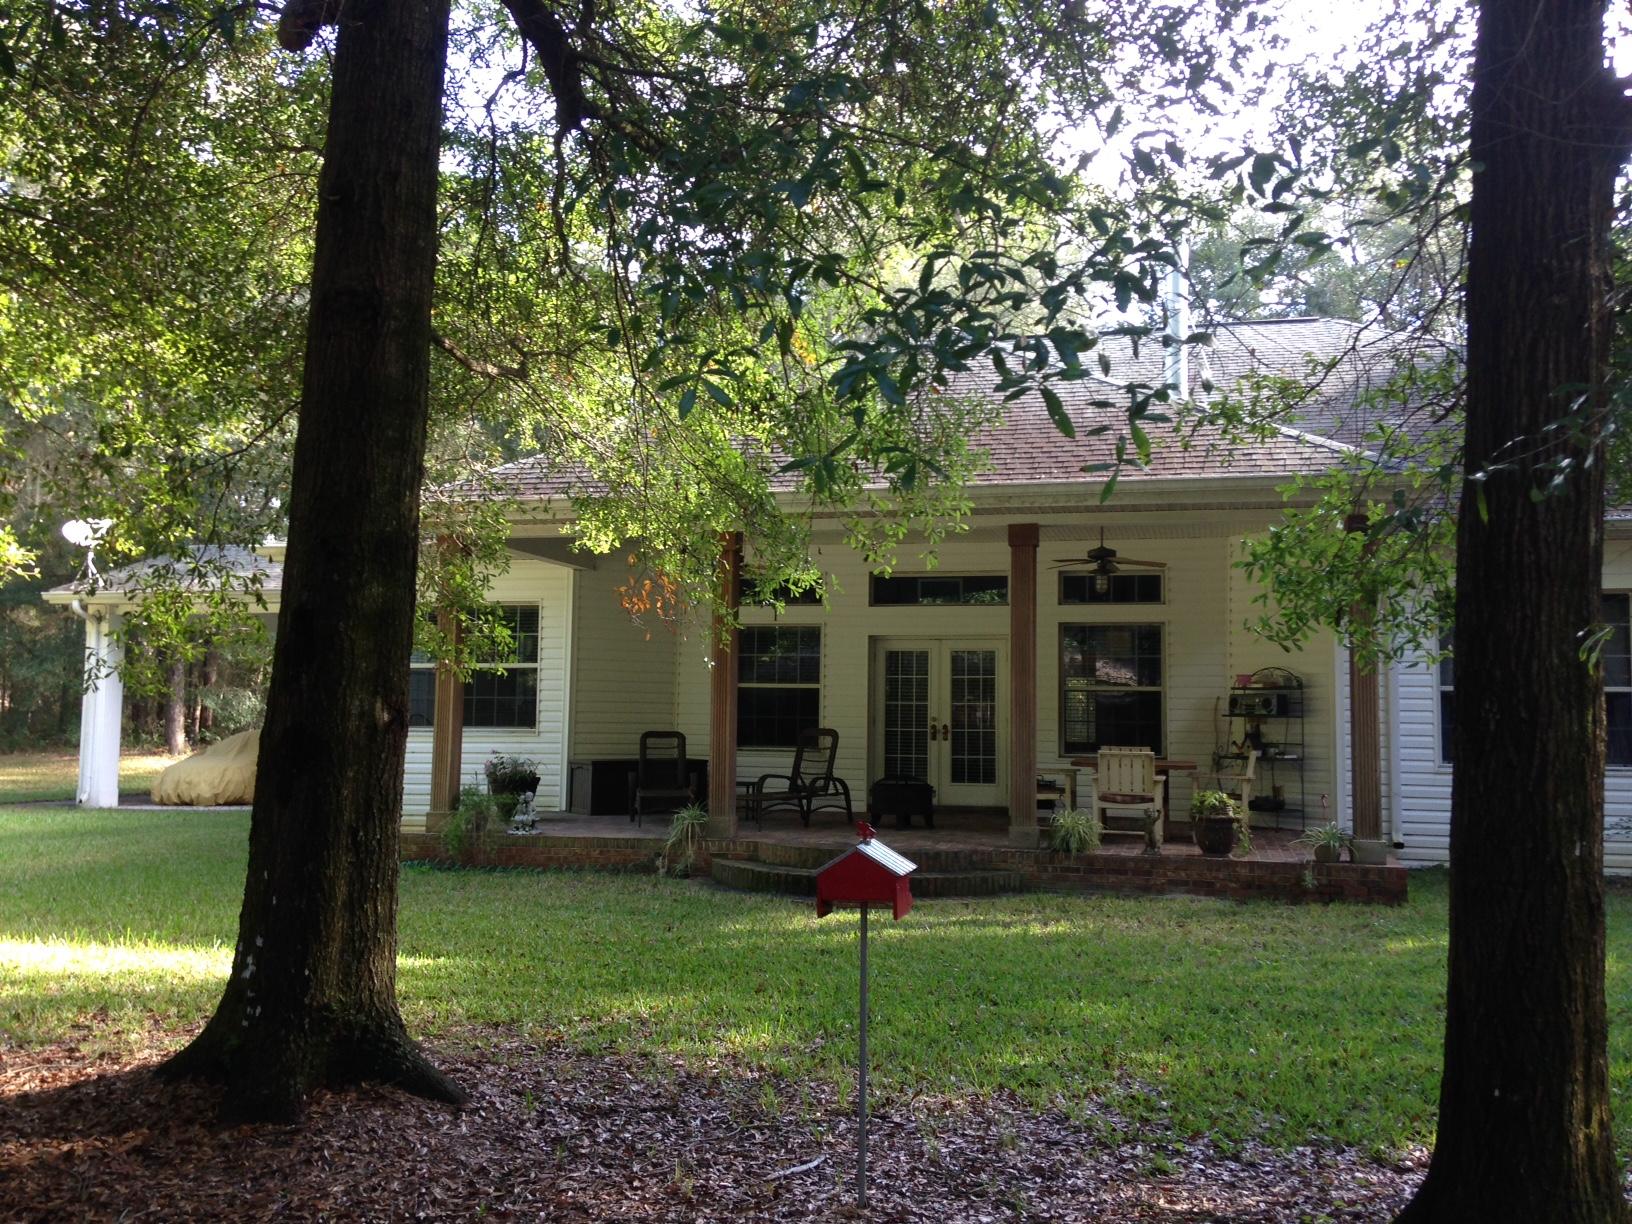 12277 Cyrano Ave., Brooksville, Florida 34601